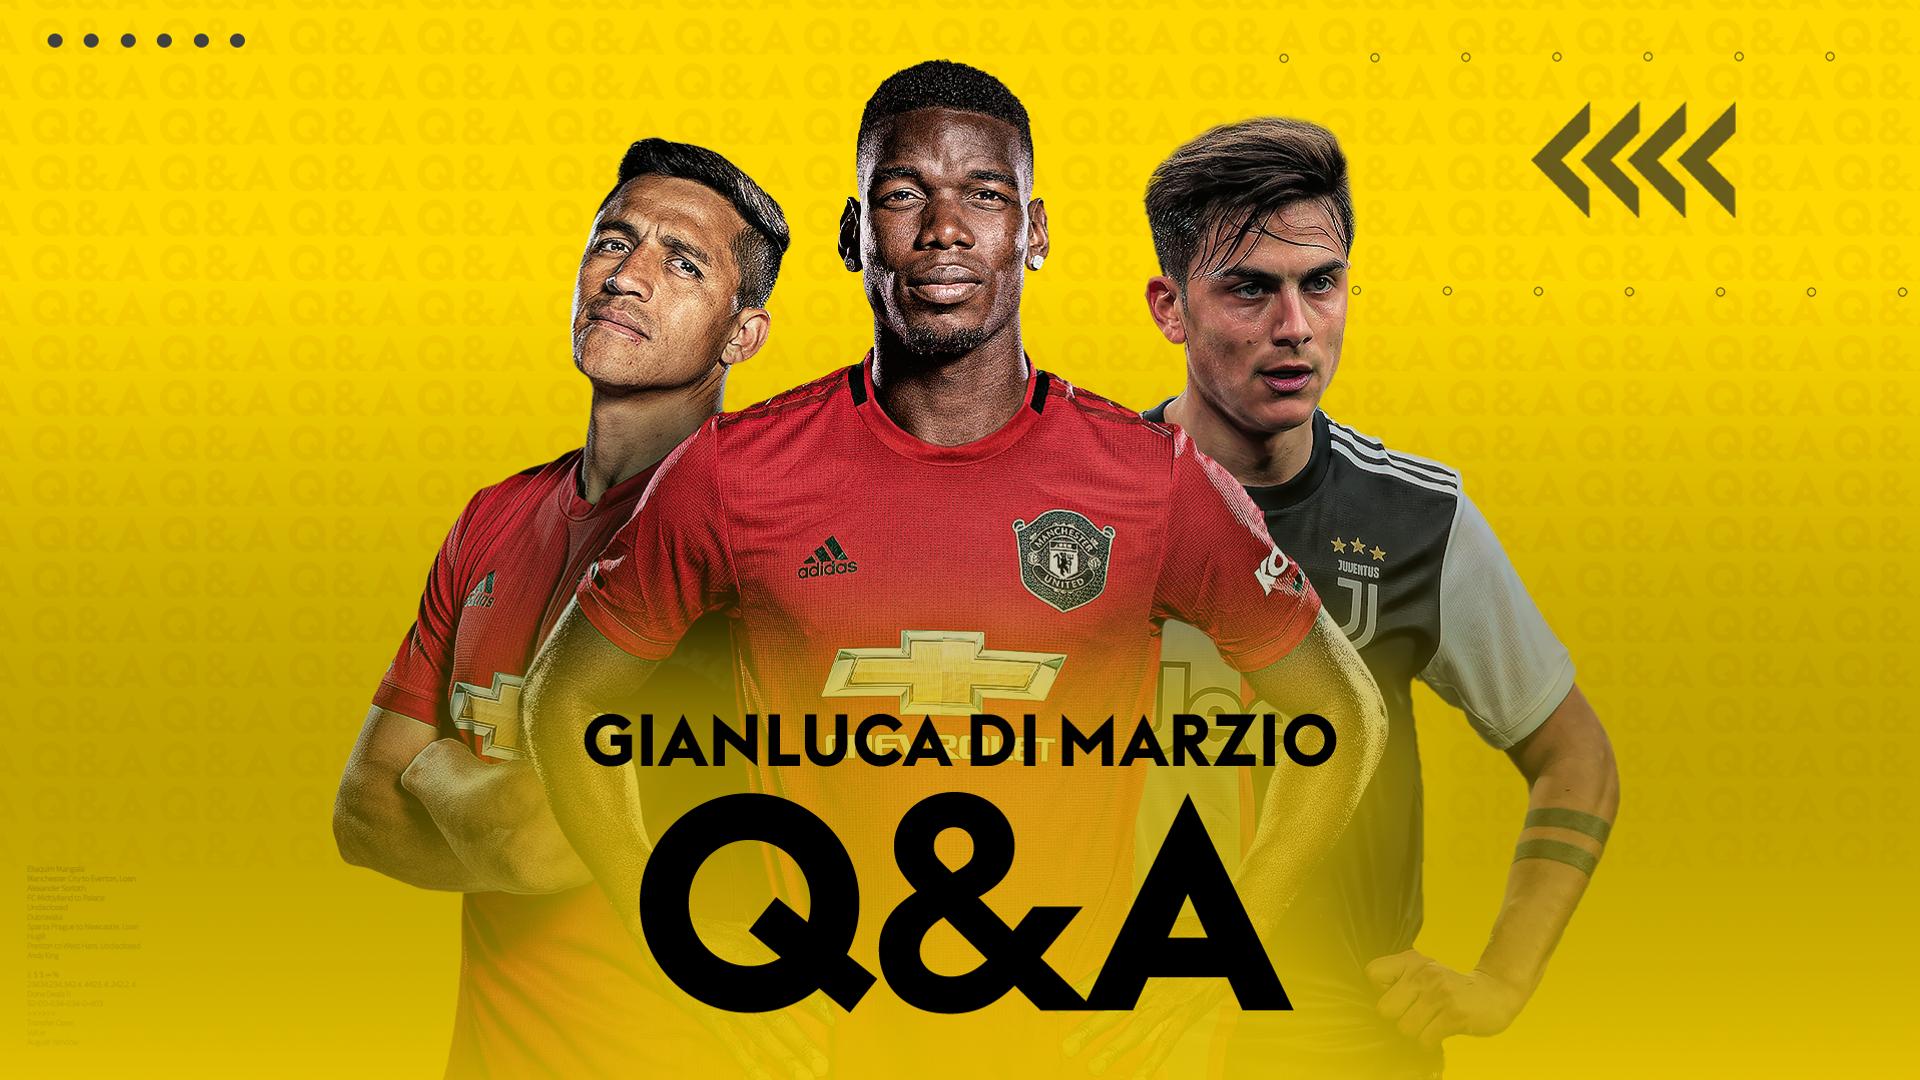 Di Marzio Transfer Q&A: Pogba, Aubameyang, Coutinho & more